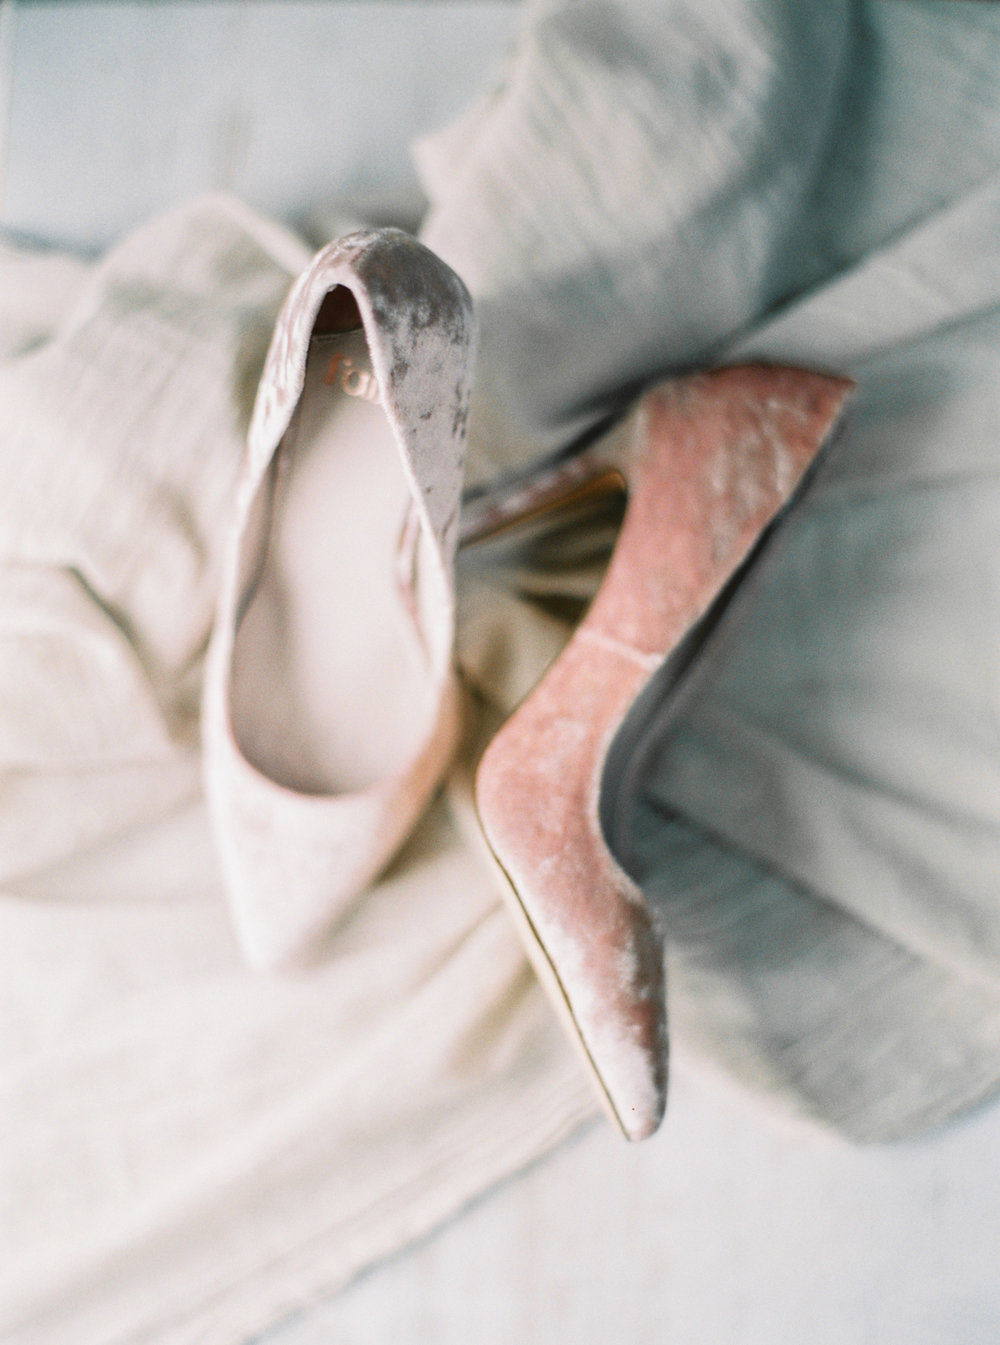 Luxury Wedding Planner UK | Our Chic & Romantic Engagement Shoot in Bath | Katie Julia Photography - 7.JPG